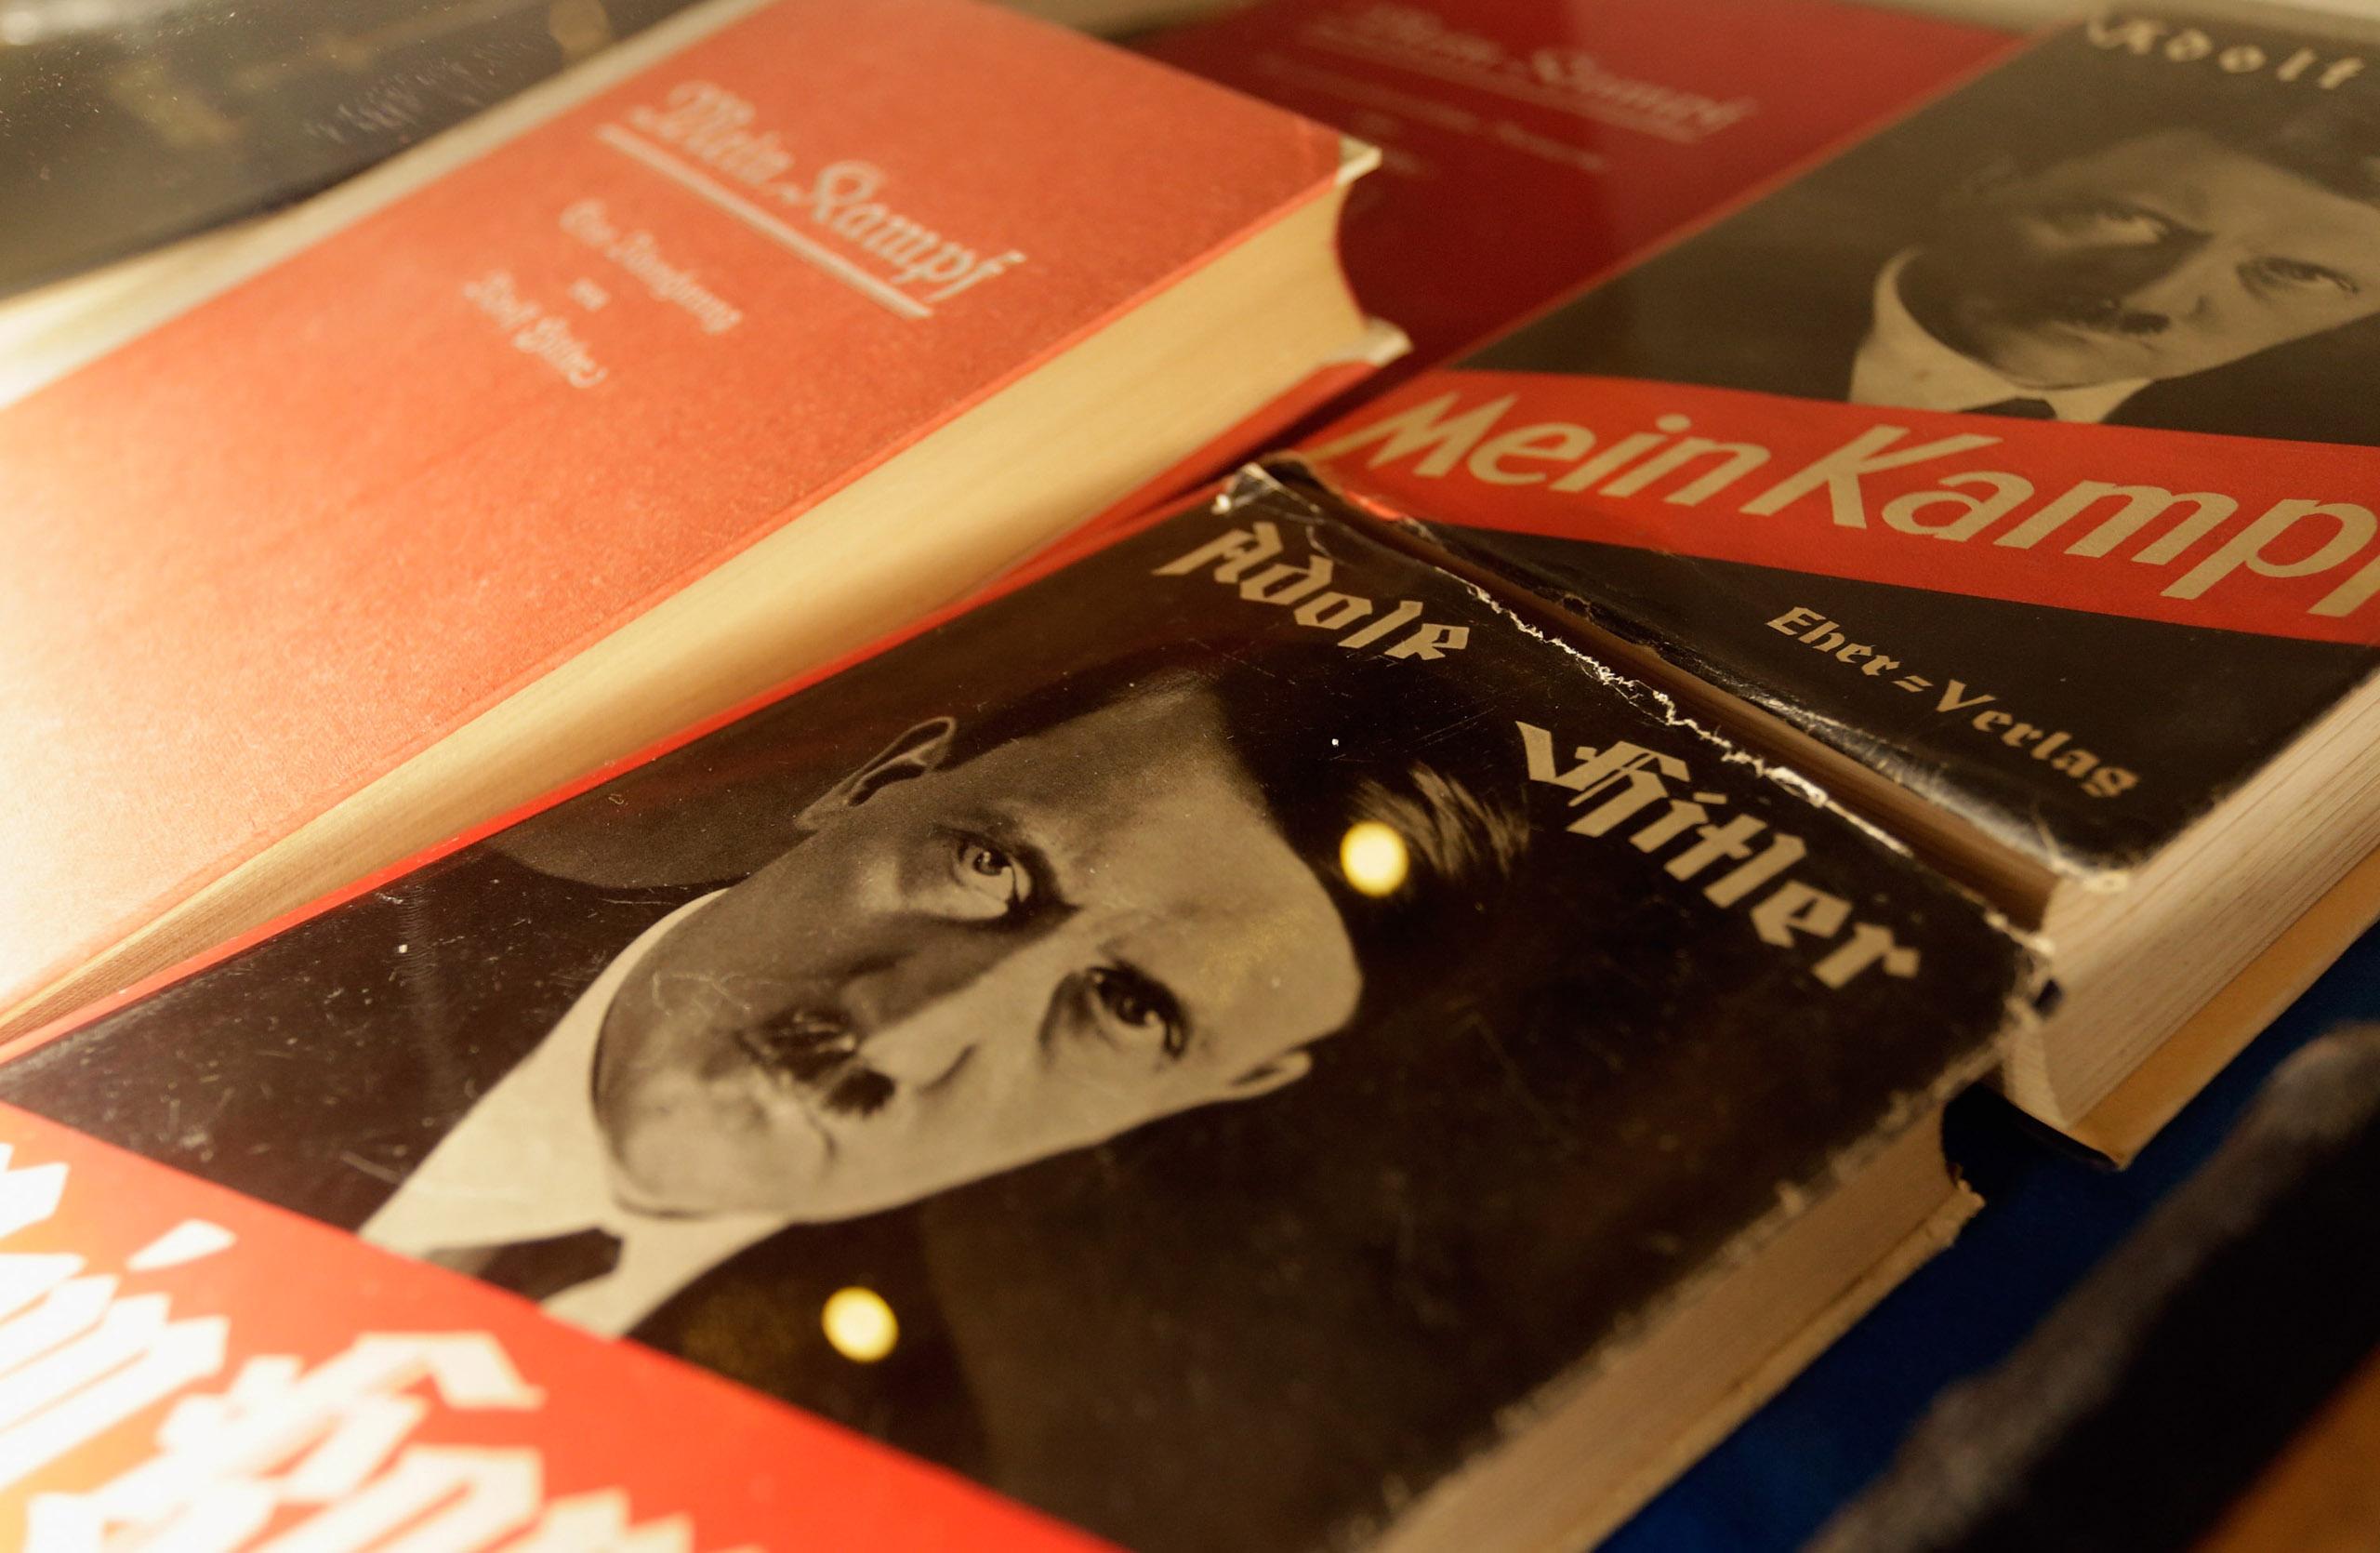 Historic copies of Adolf Hitler's  Mein Kampf.